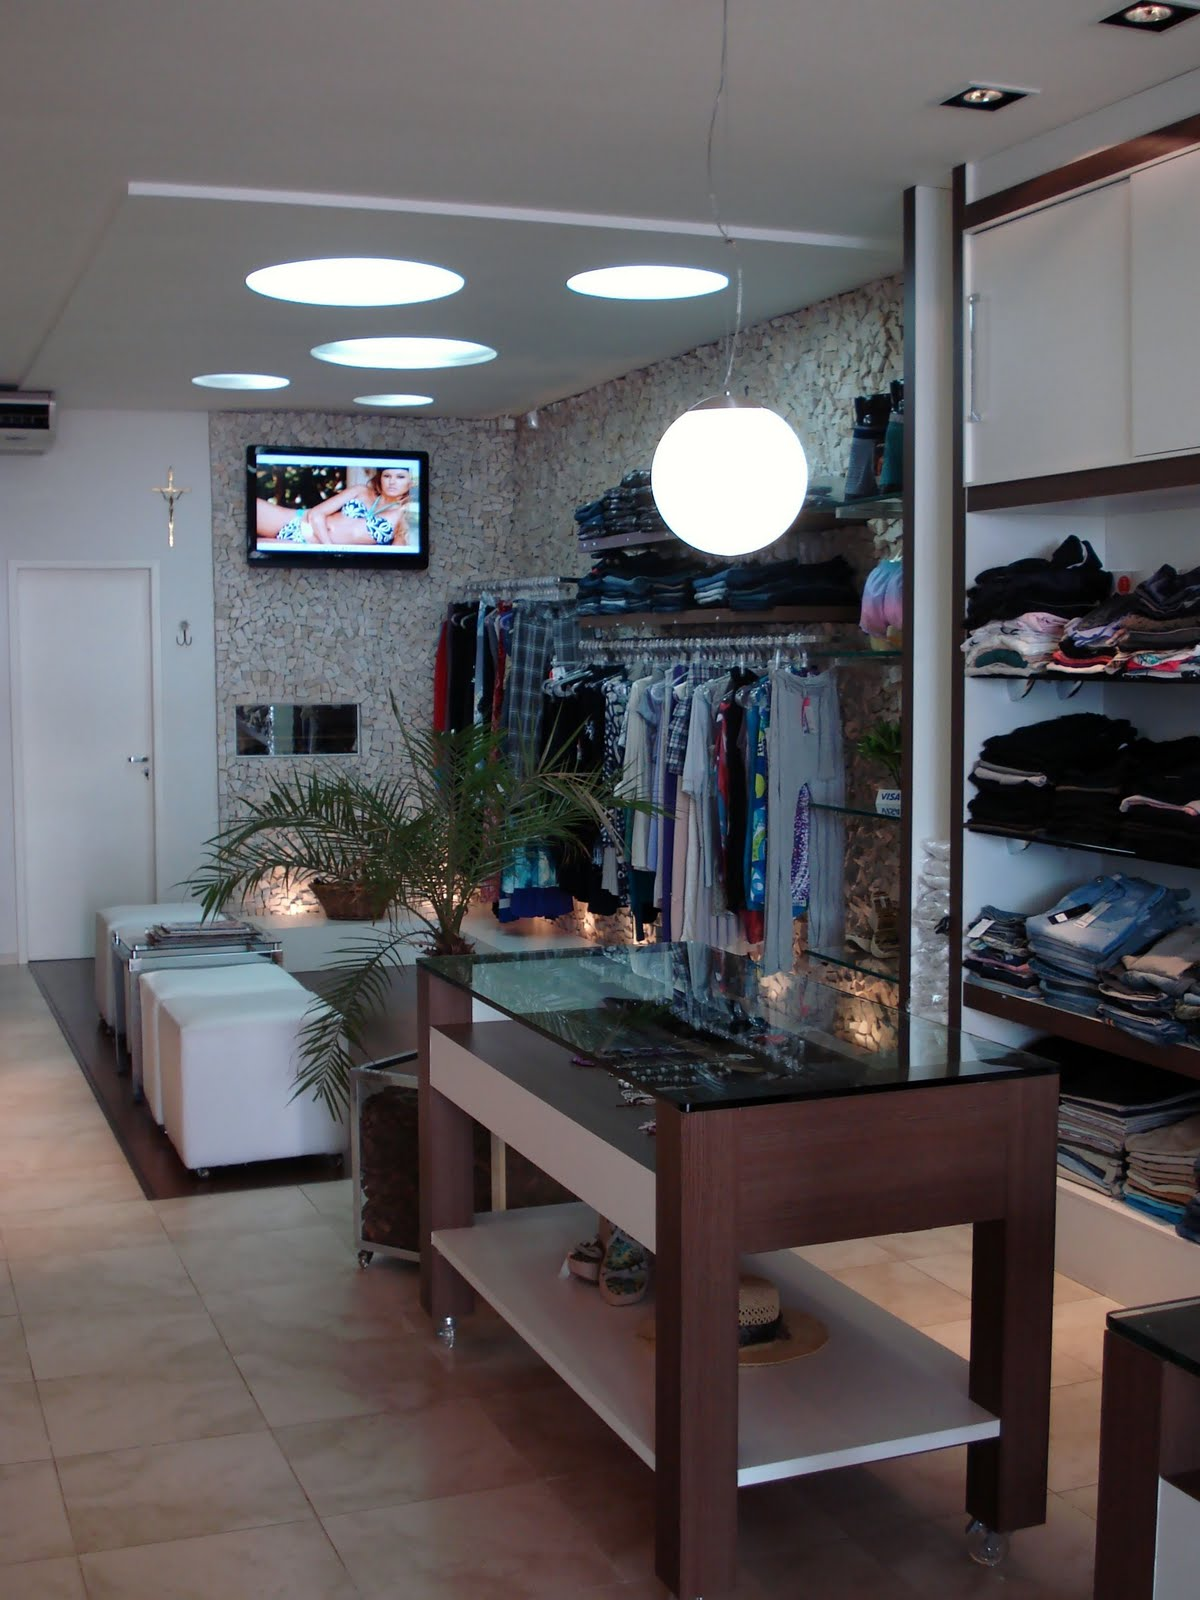 decoracao de interiores de lojas de roupas:Decoração de interiores e lojas de roupa e desporto, lojas – Holiday